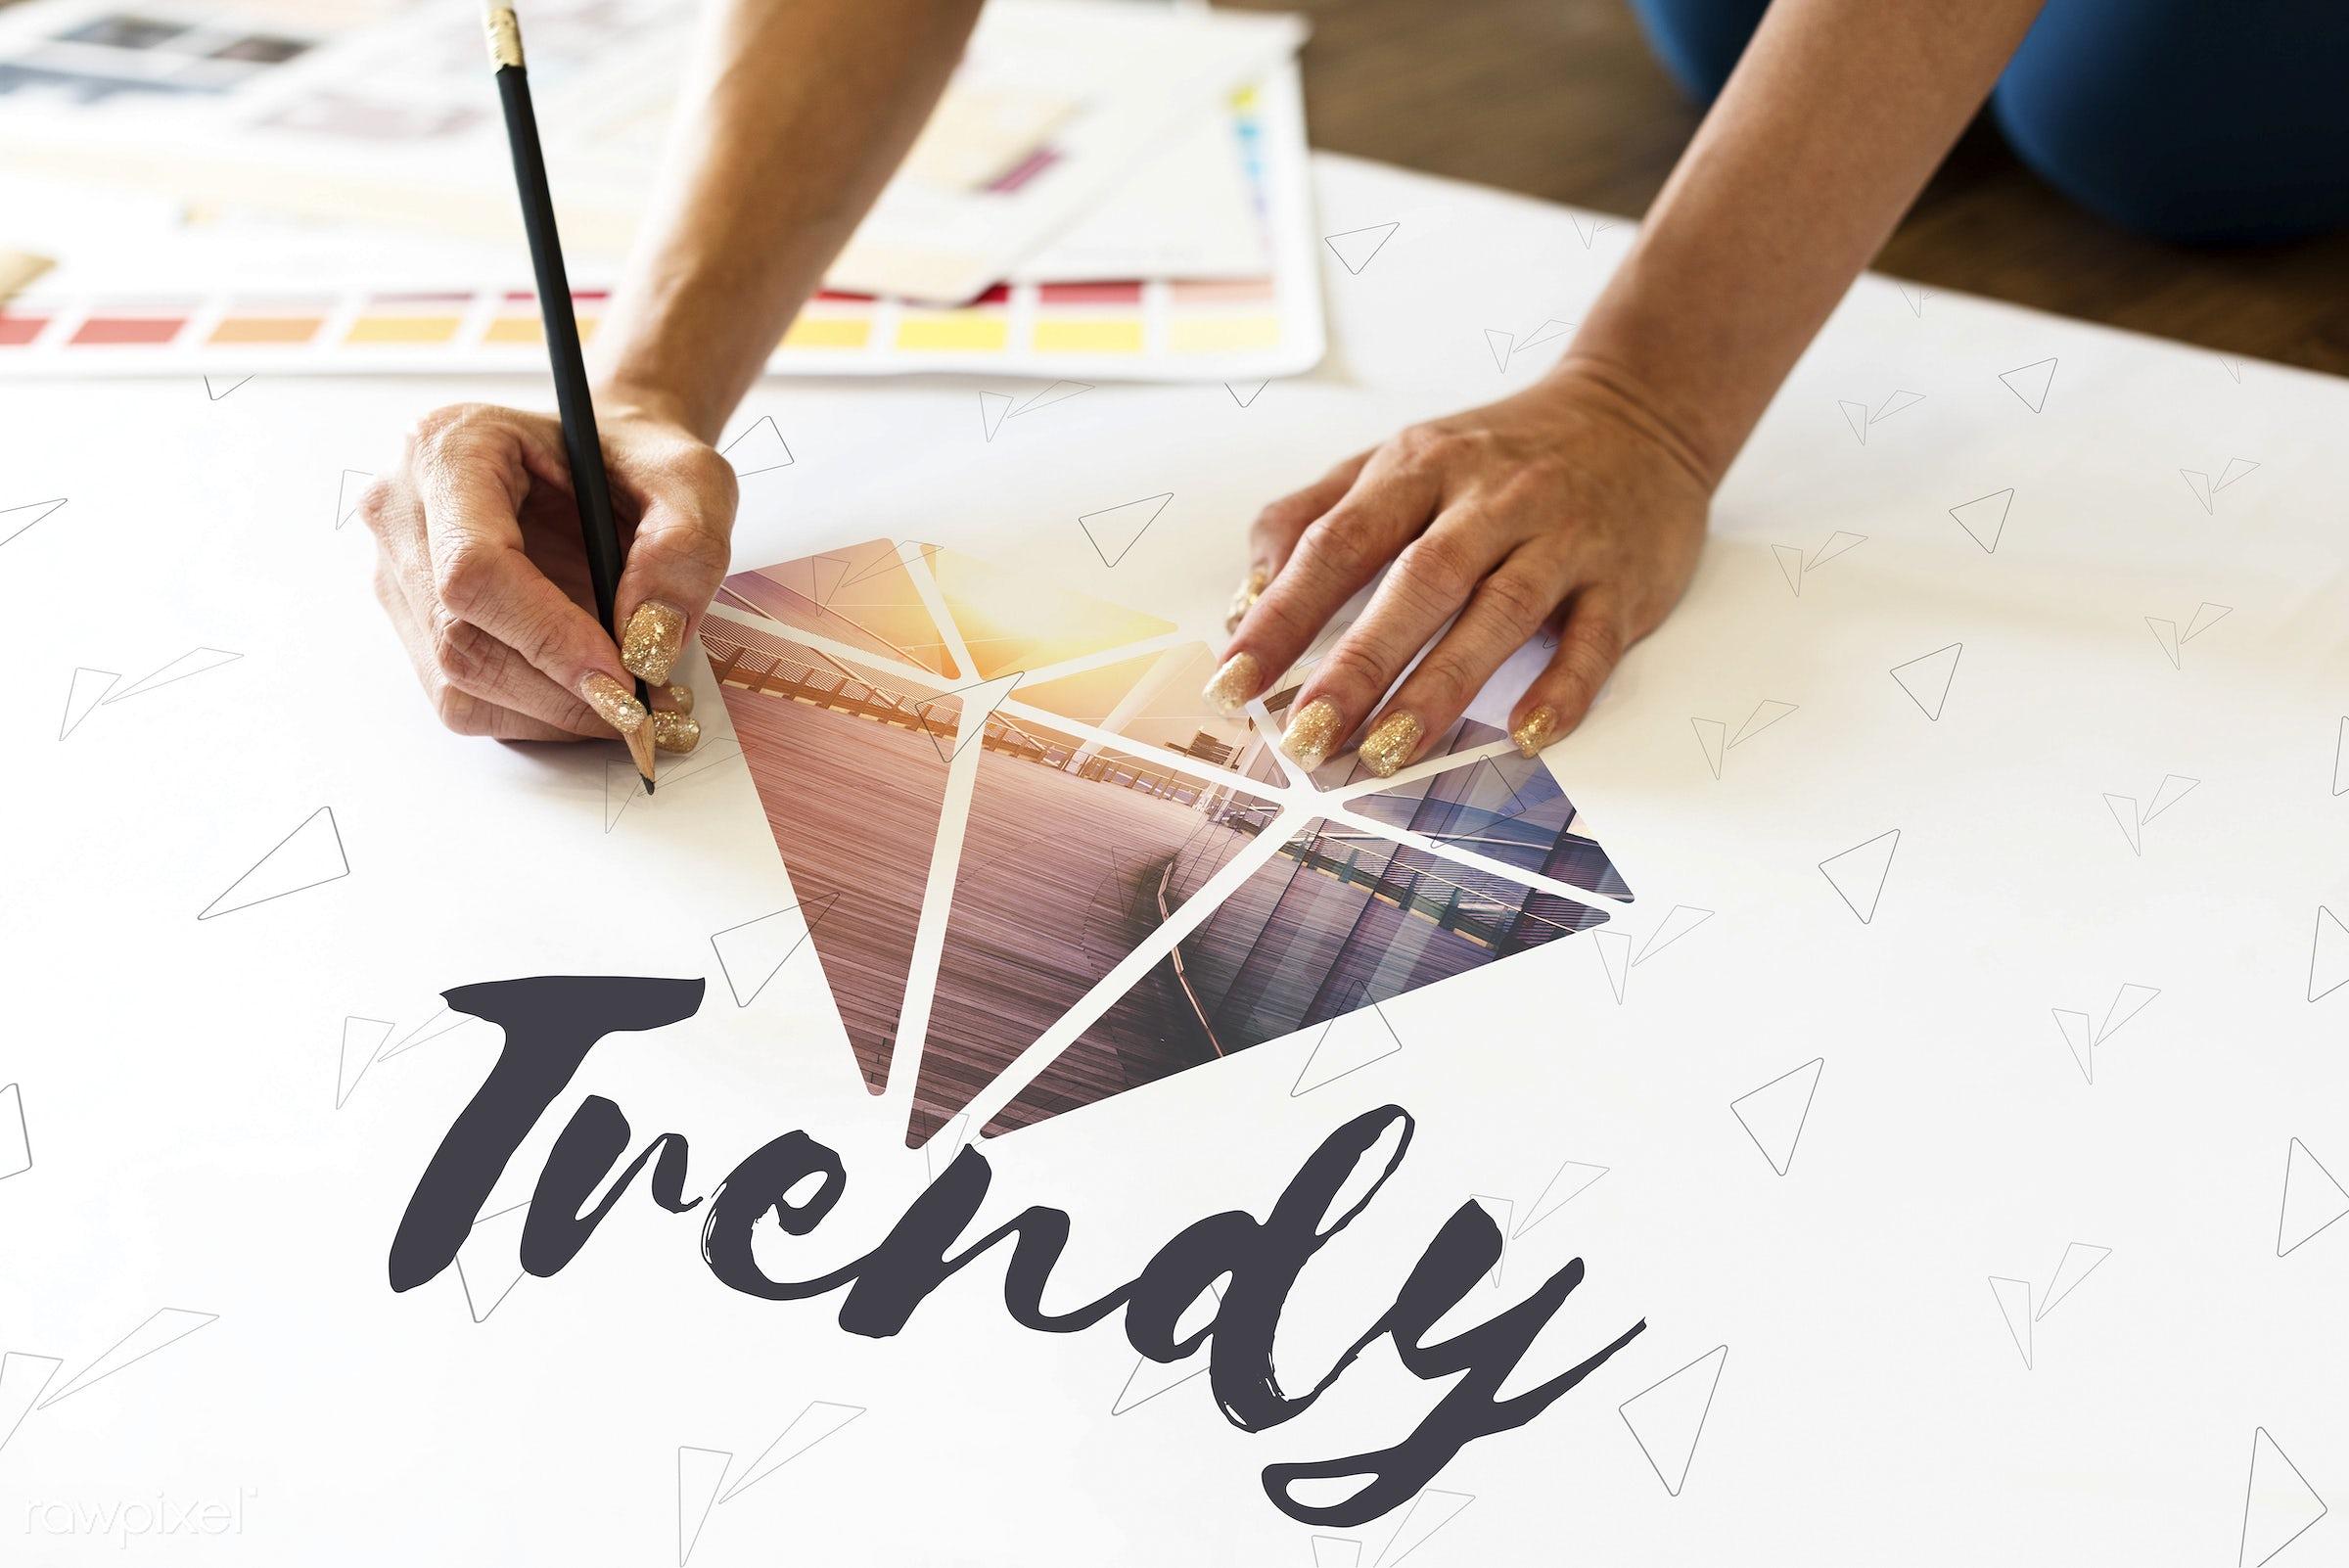 art, business, creation, creative, creativity, design, diamond, drawing, edit, fashion, forecast, hands, hot, ideas,...